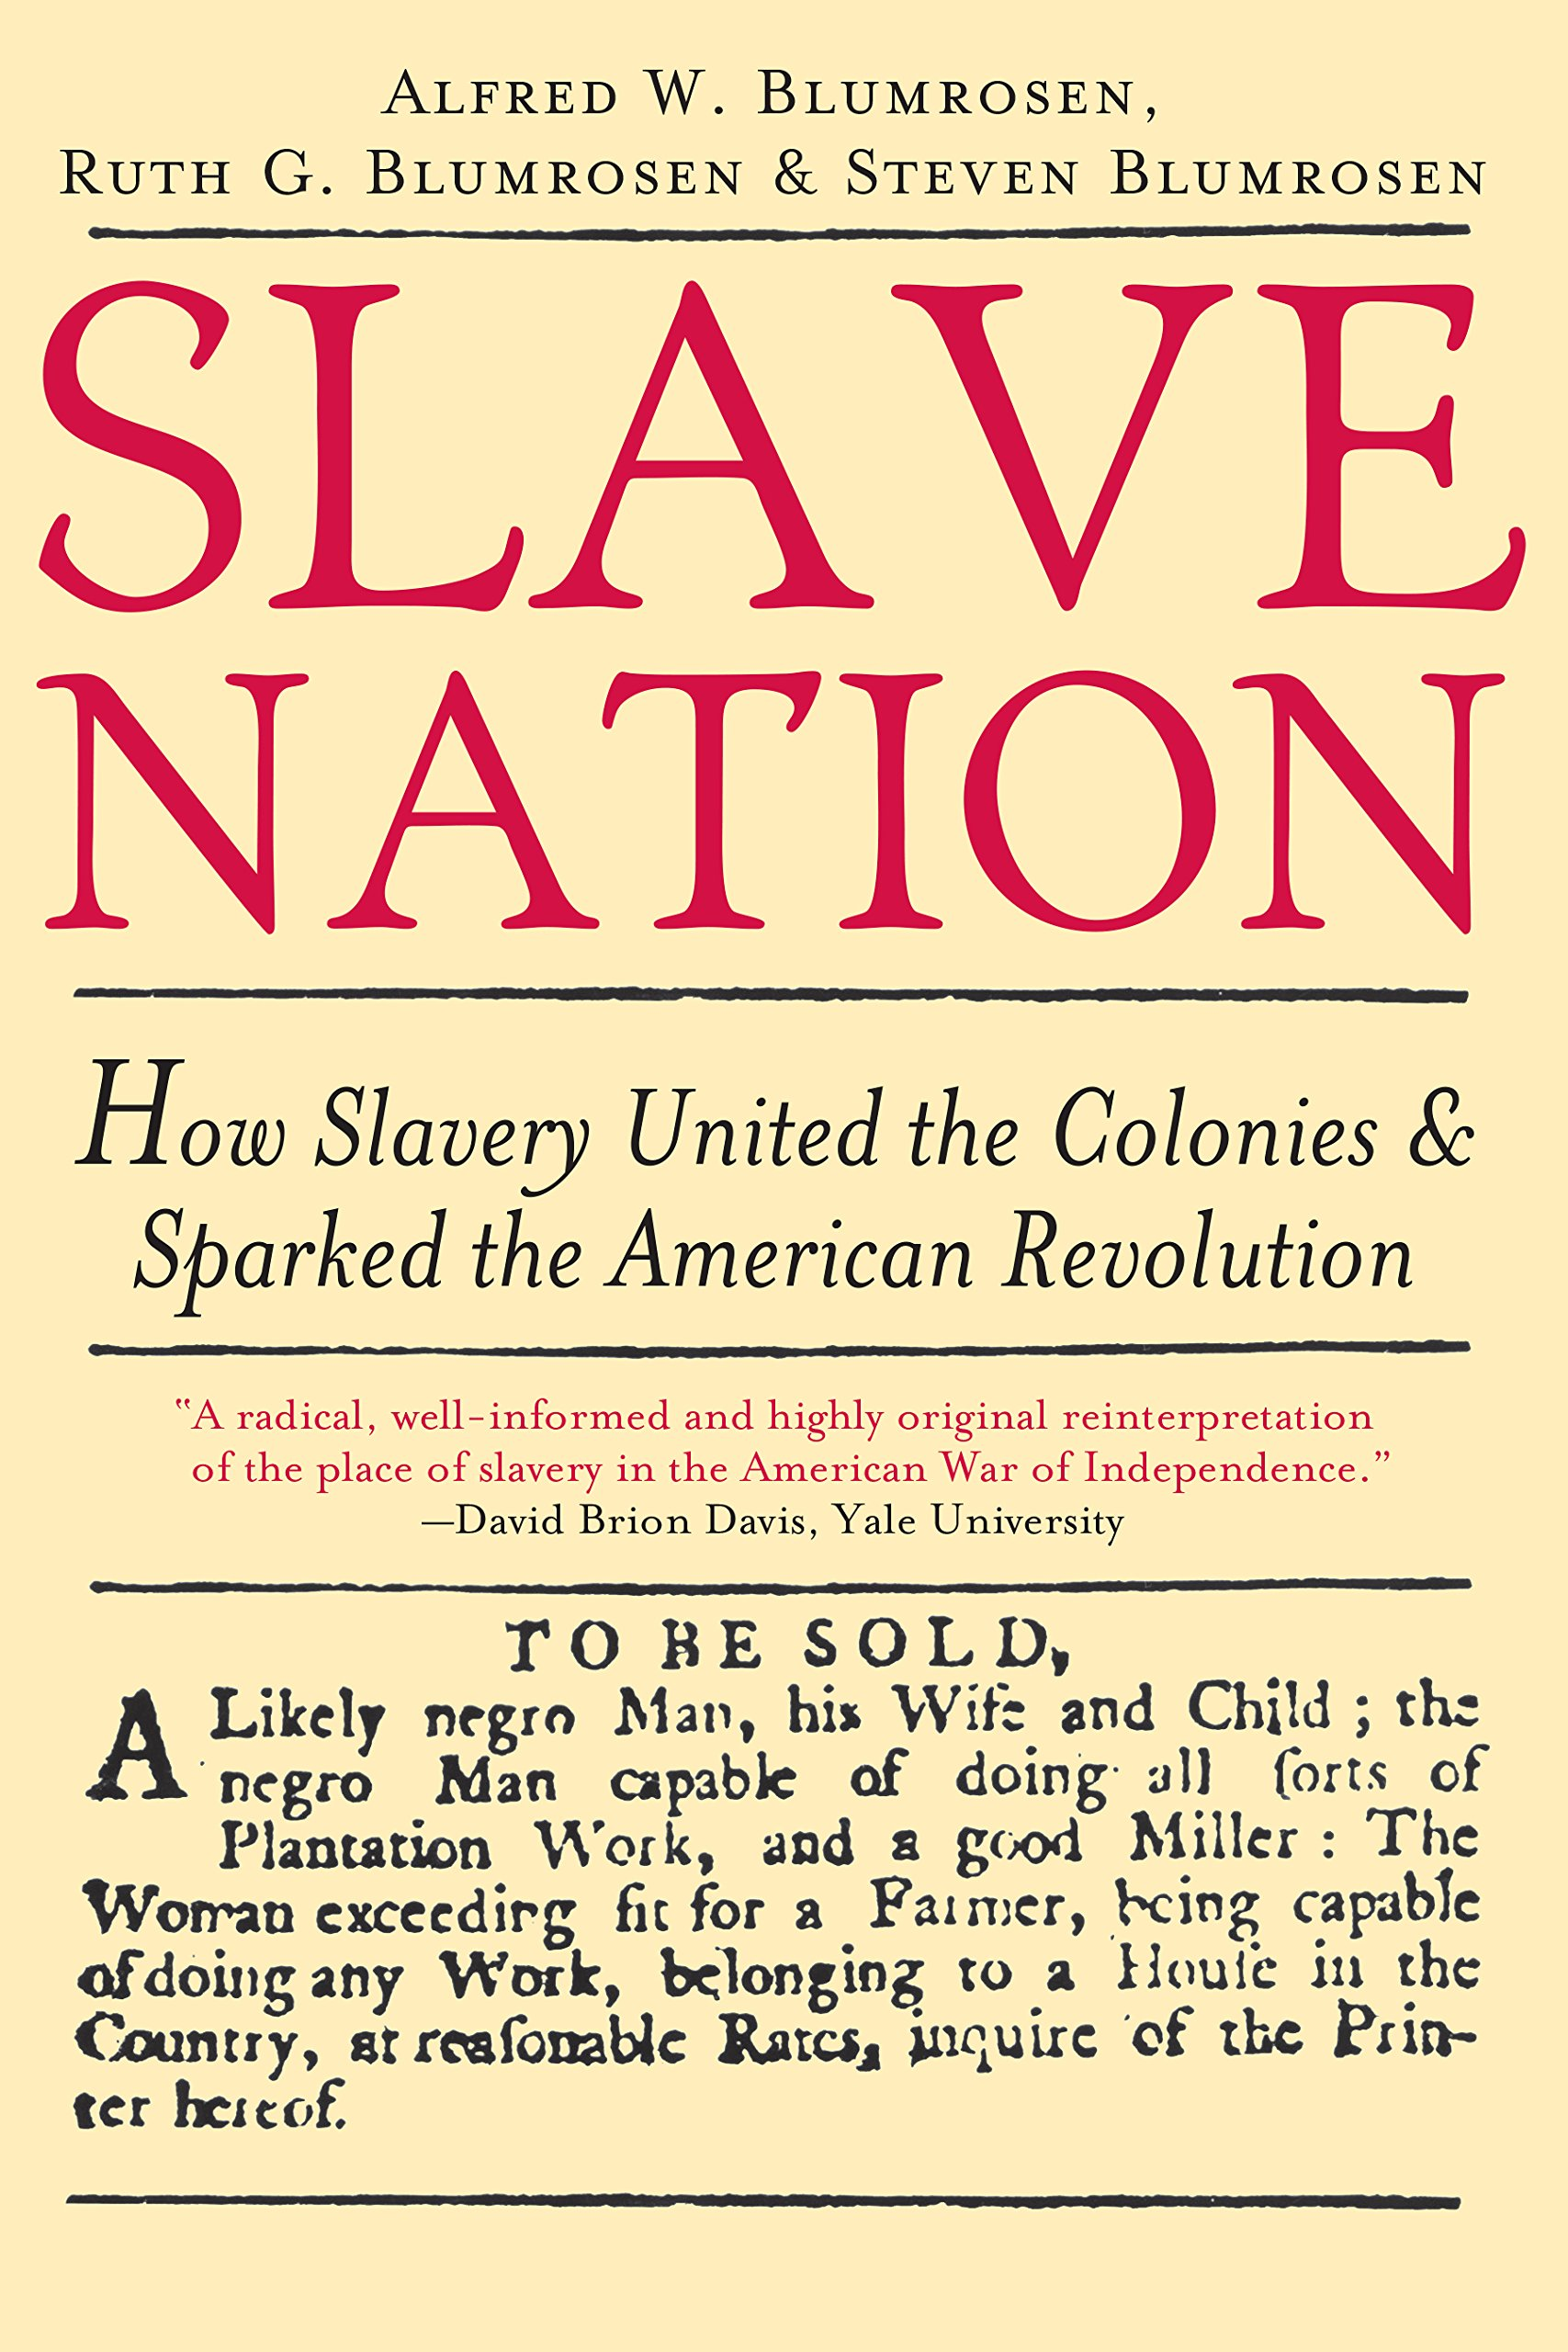 slave nation how slavery united the colonies and sparked the slave nation how slavery united the colonies and sparked the american revolution alfred blumrosen 9781402206979 com books